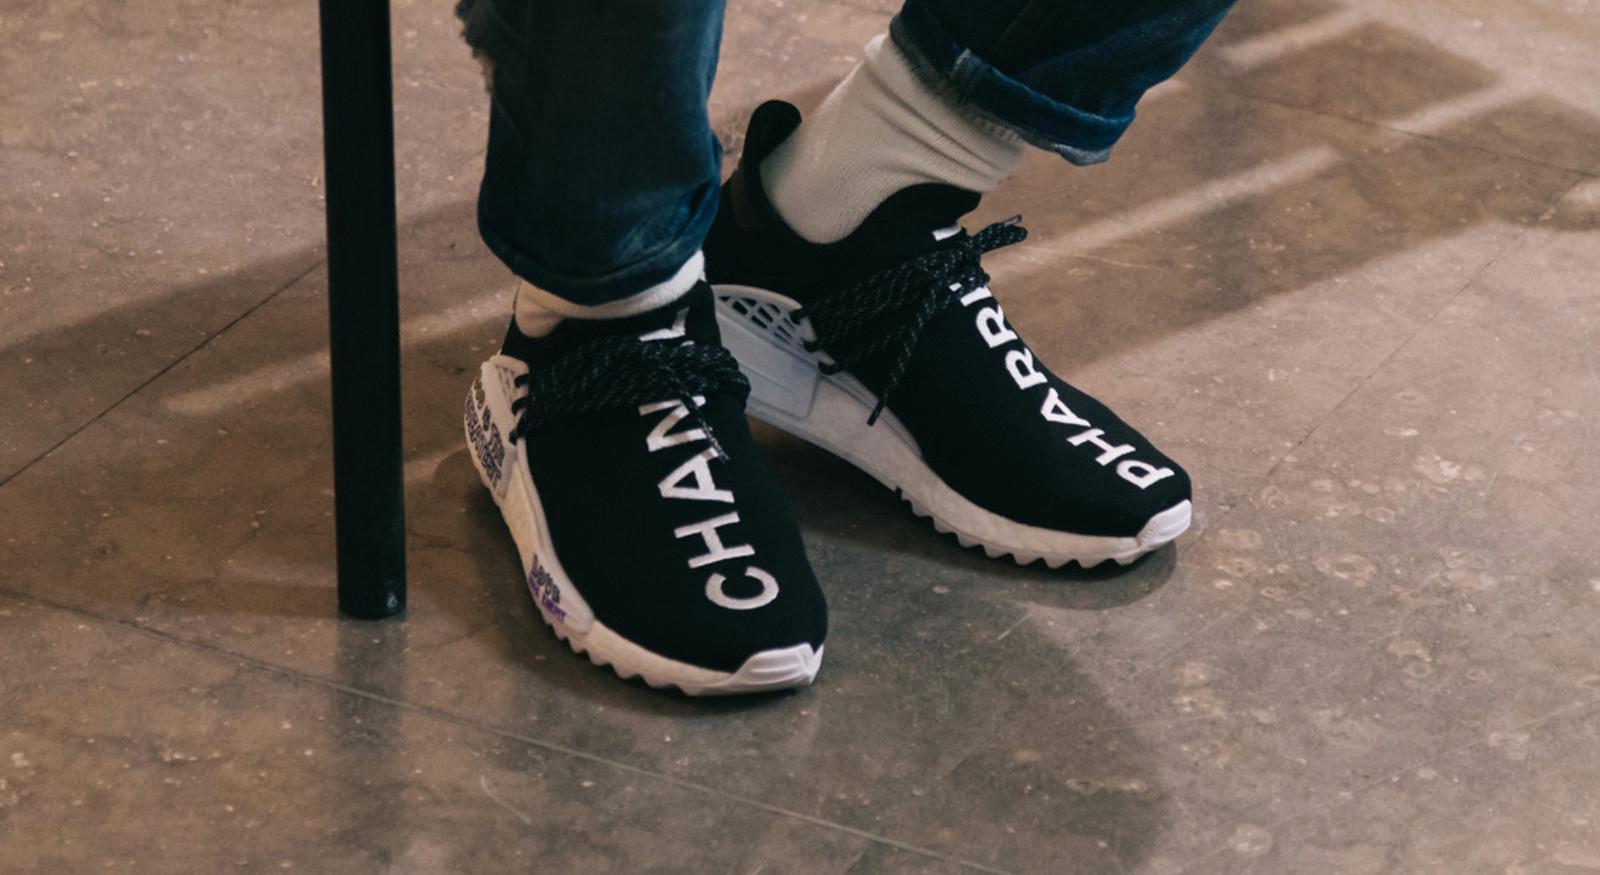 De Chanel x Pharrell x adidas NMD Hu.